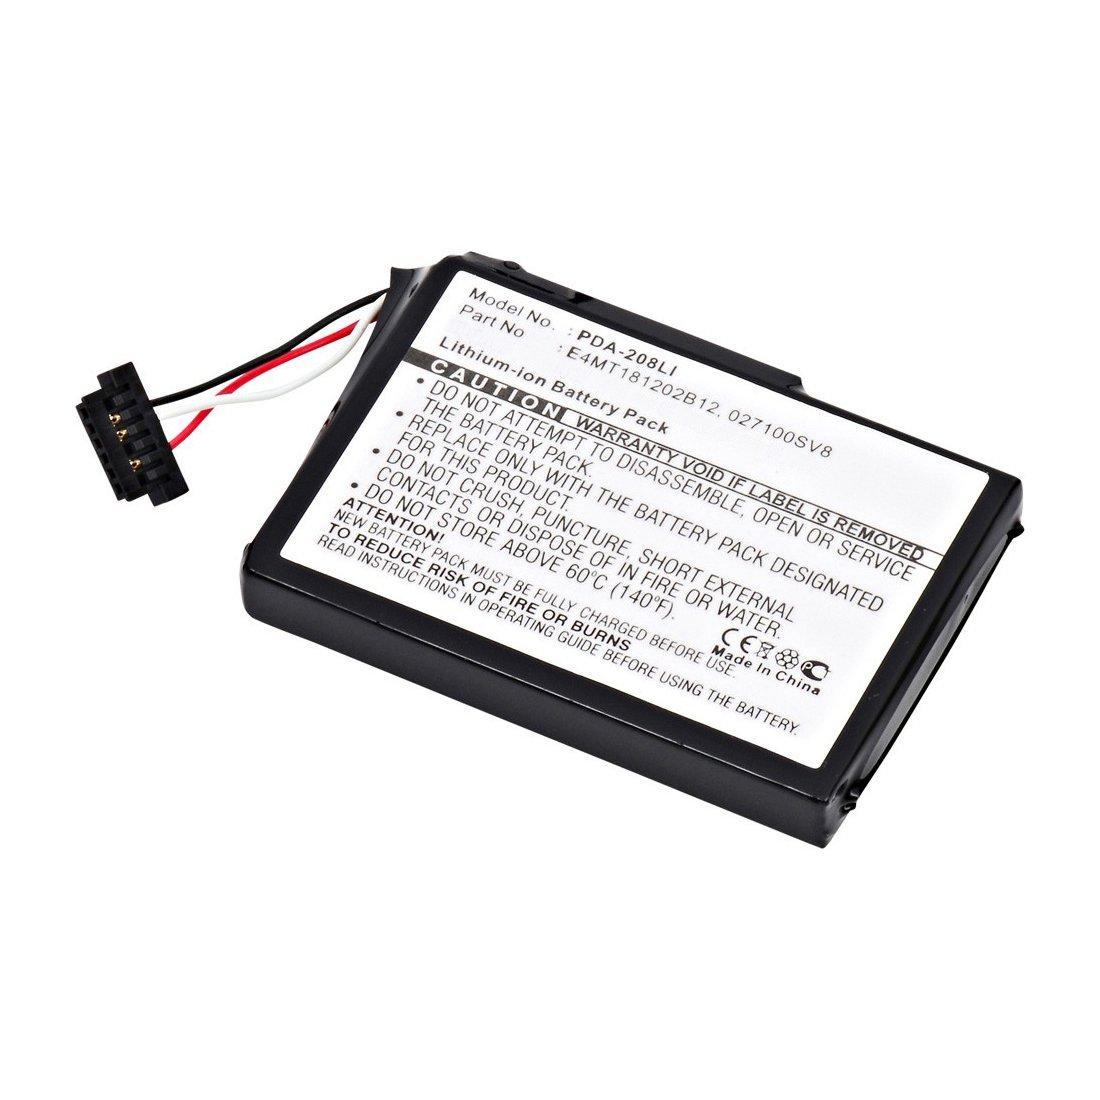 Magellan Roadmate Replacement Battery Batterymart